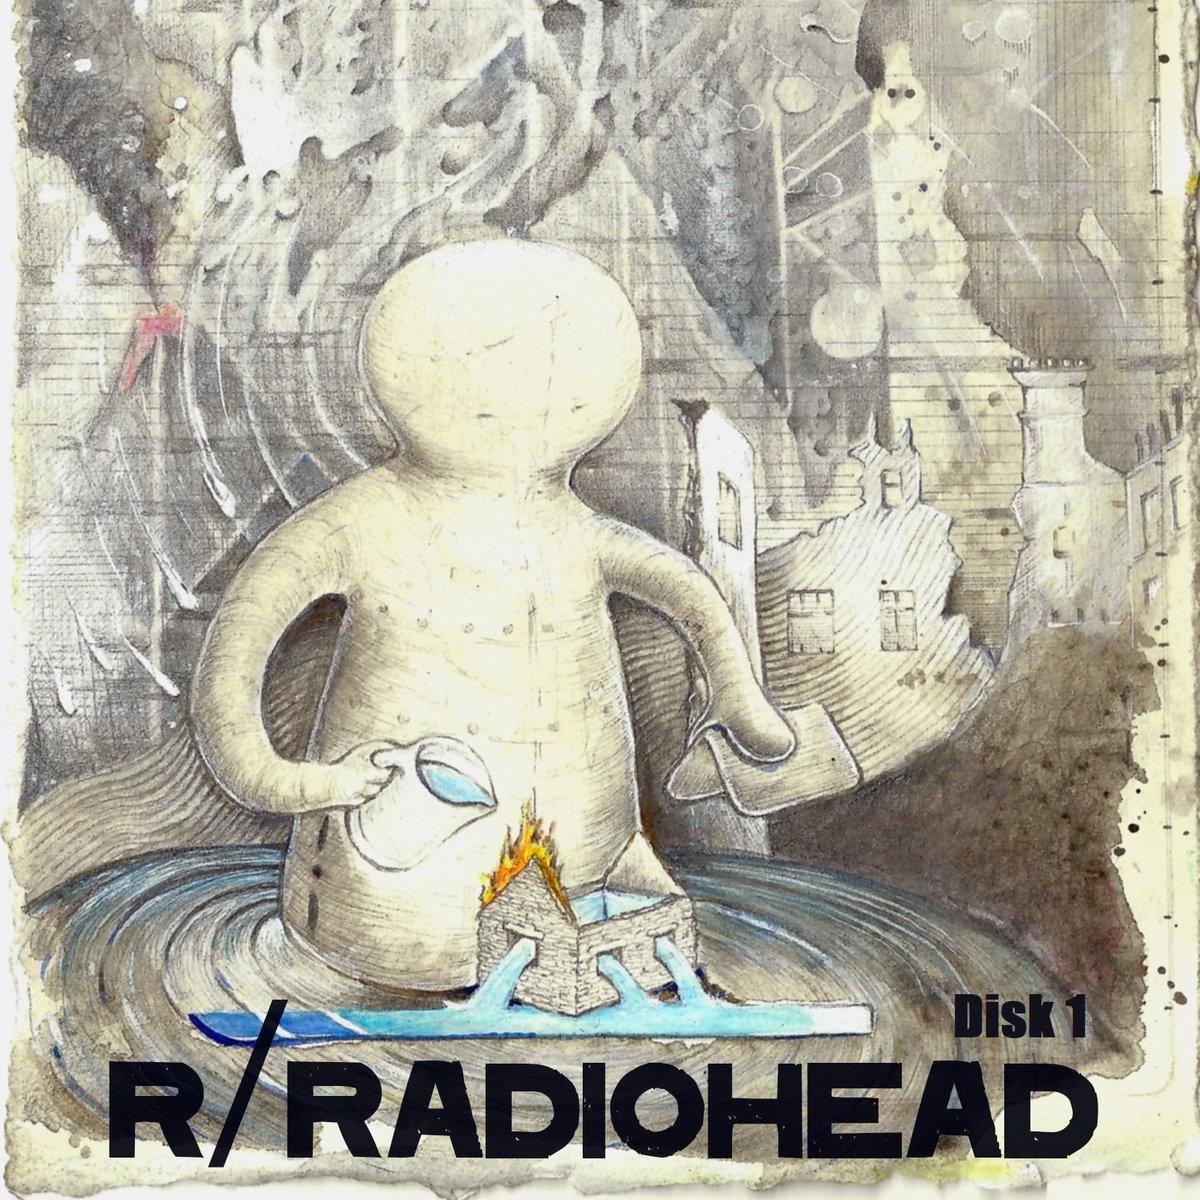 Reddit Tribute to Radiohead 2018 (Part 1) | Radiohead Reddit